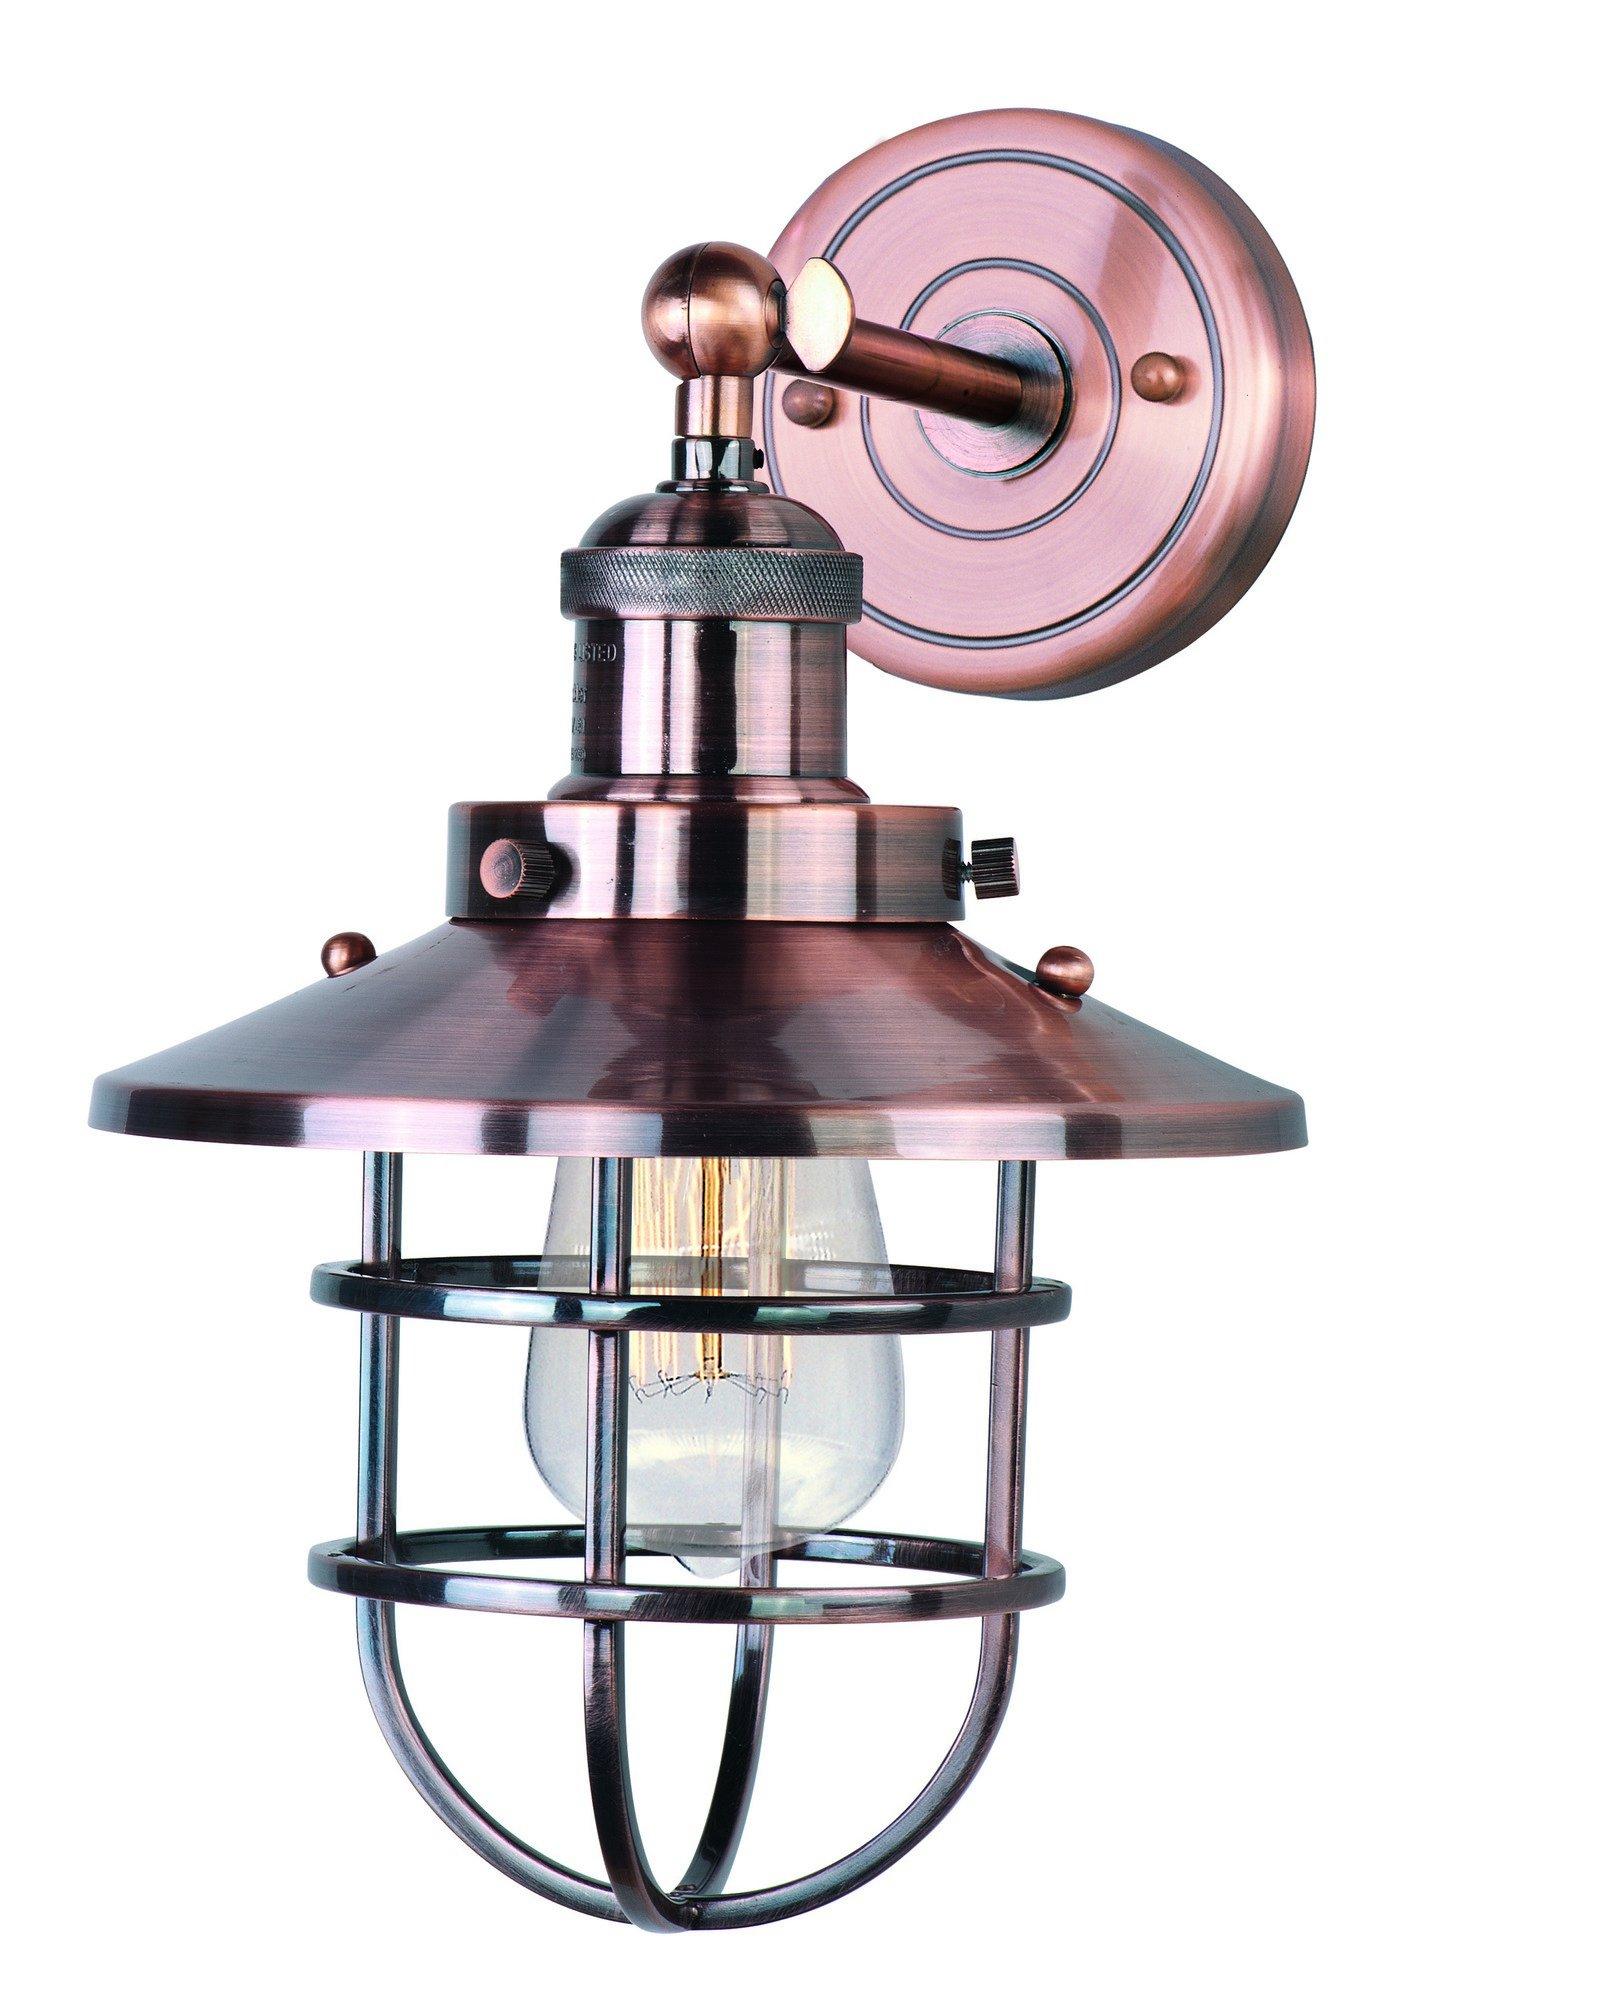 Maxim Lighting 25070ACP Mini Hi-Bay-Wall Sconce 1-Light, Antique Copper